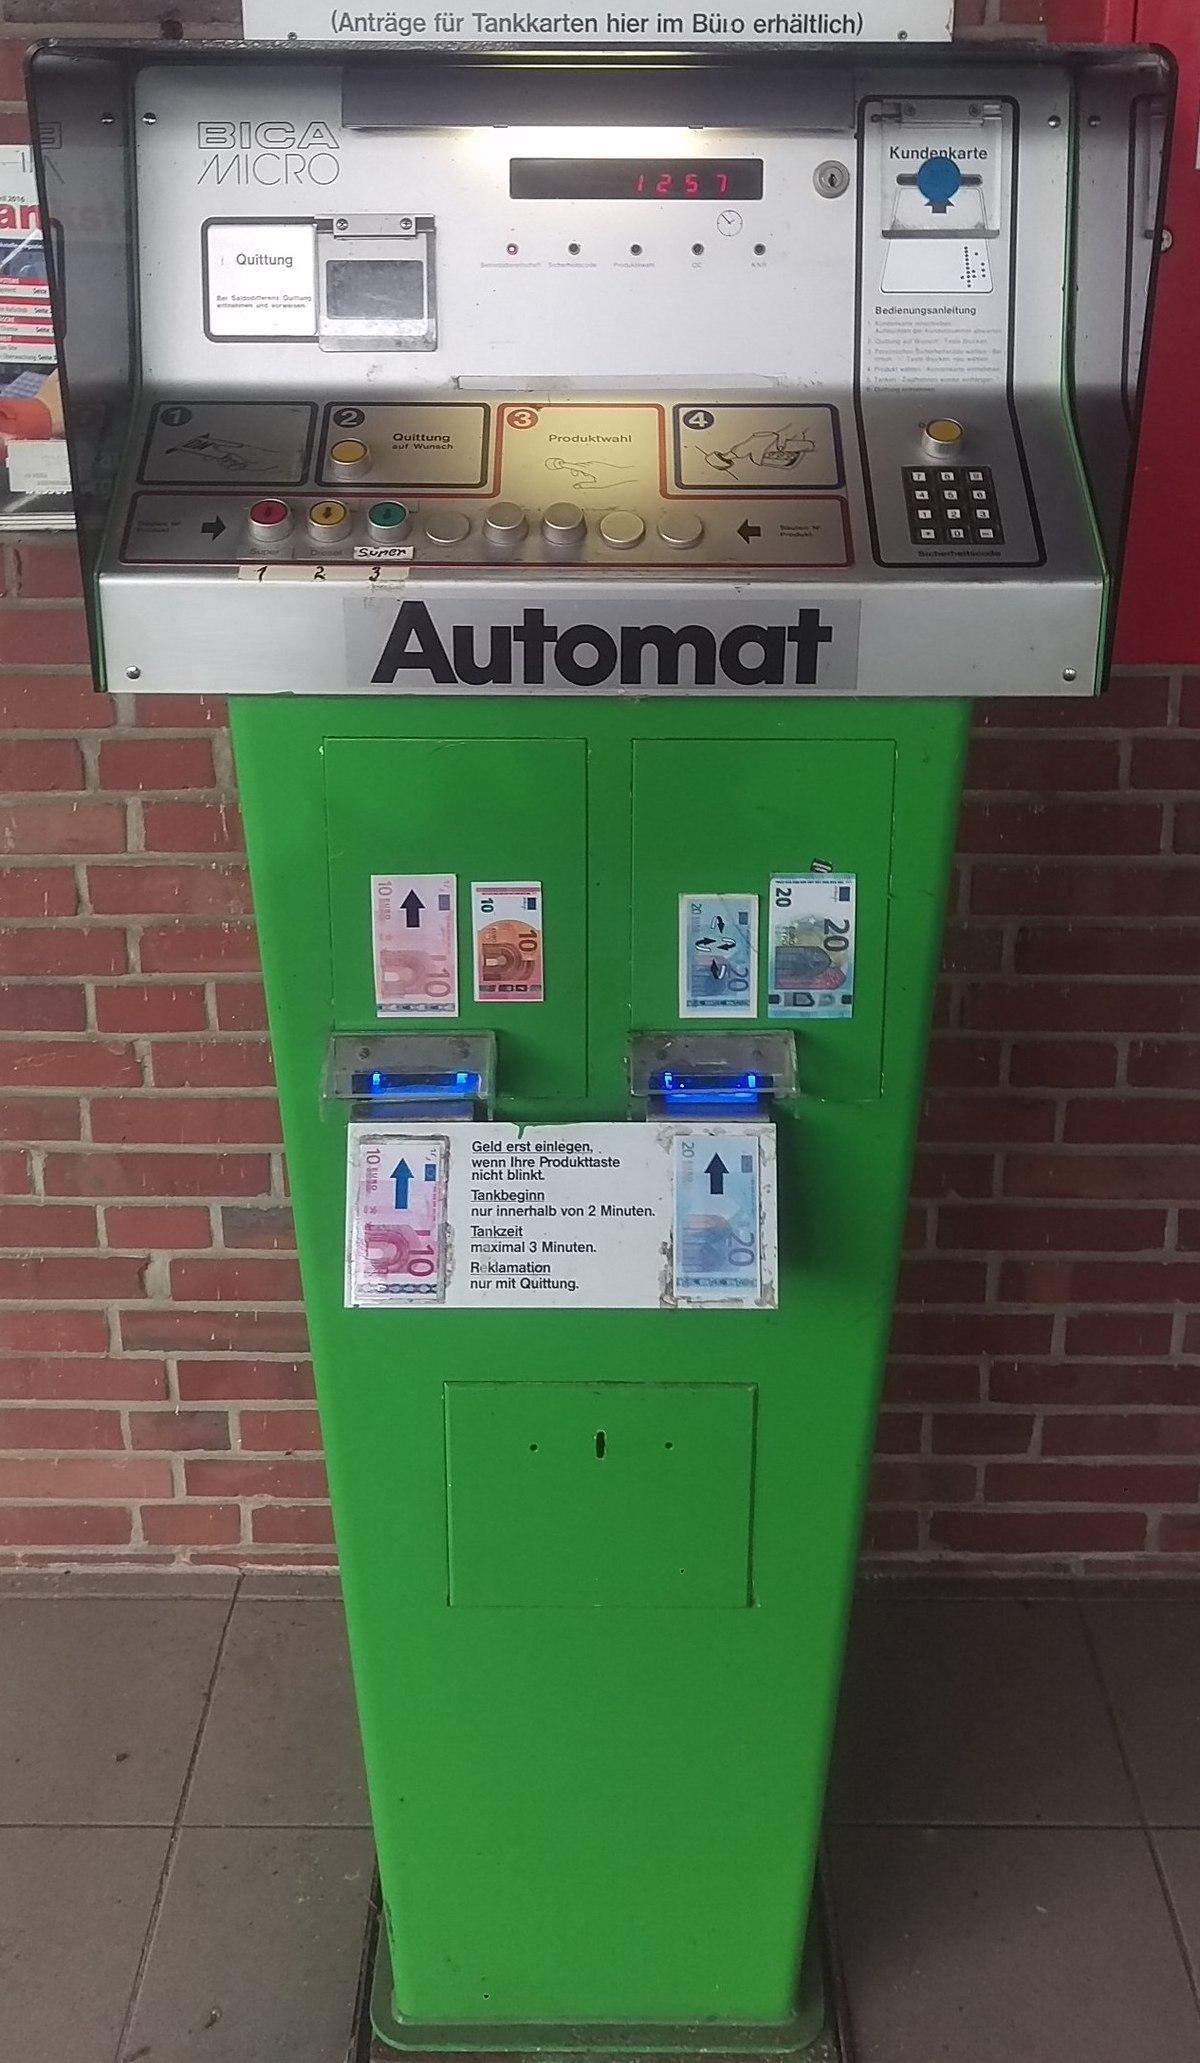 Tankautomat